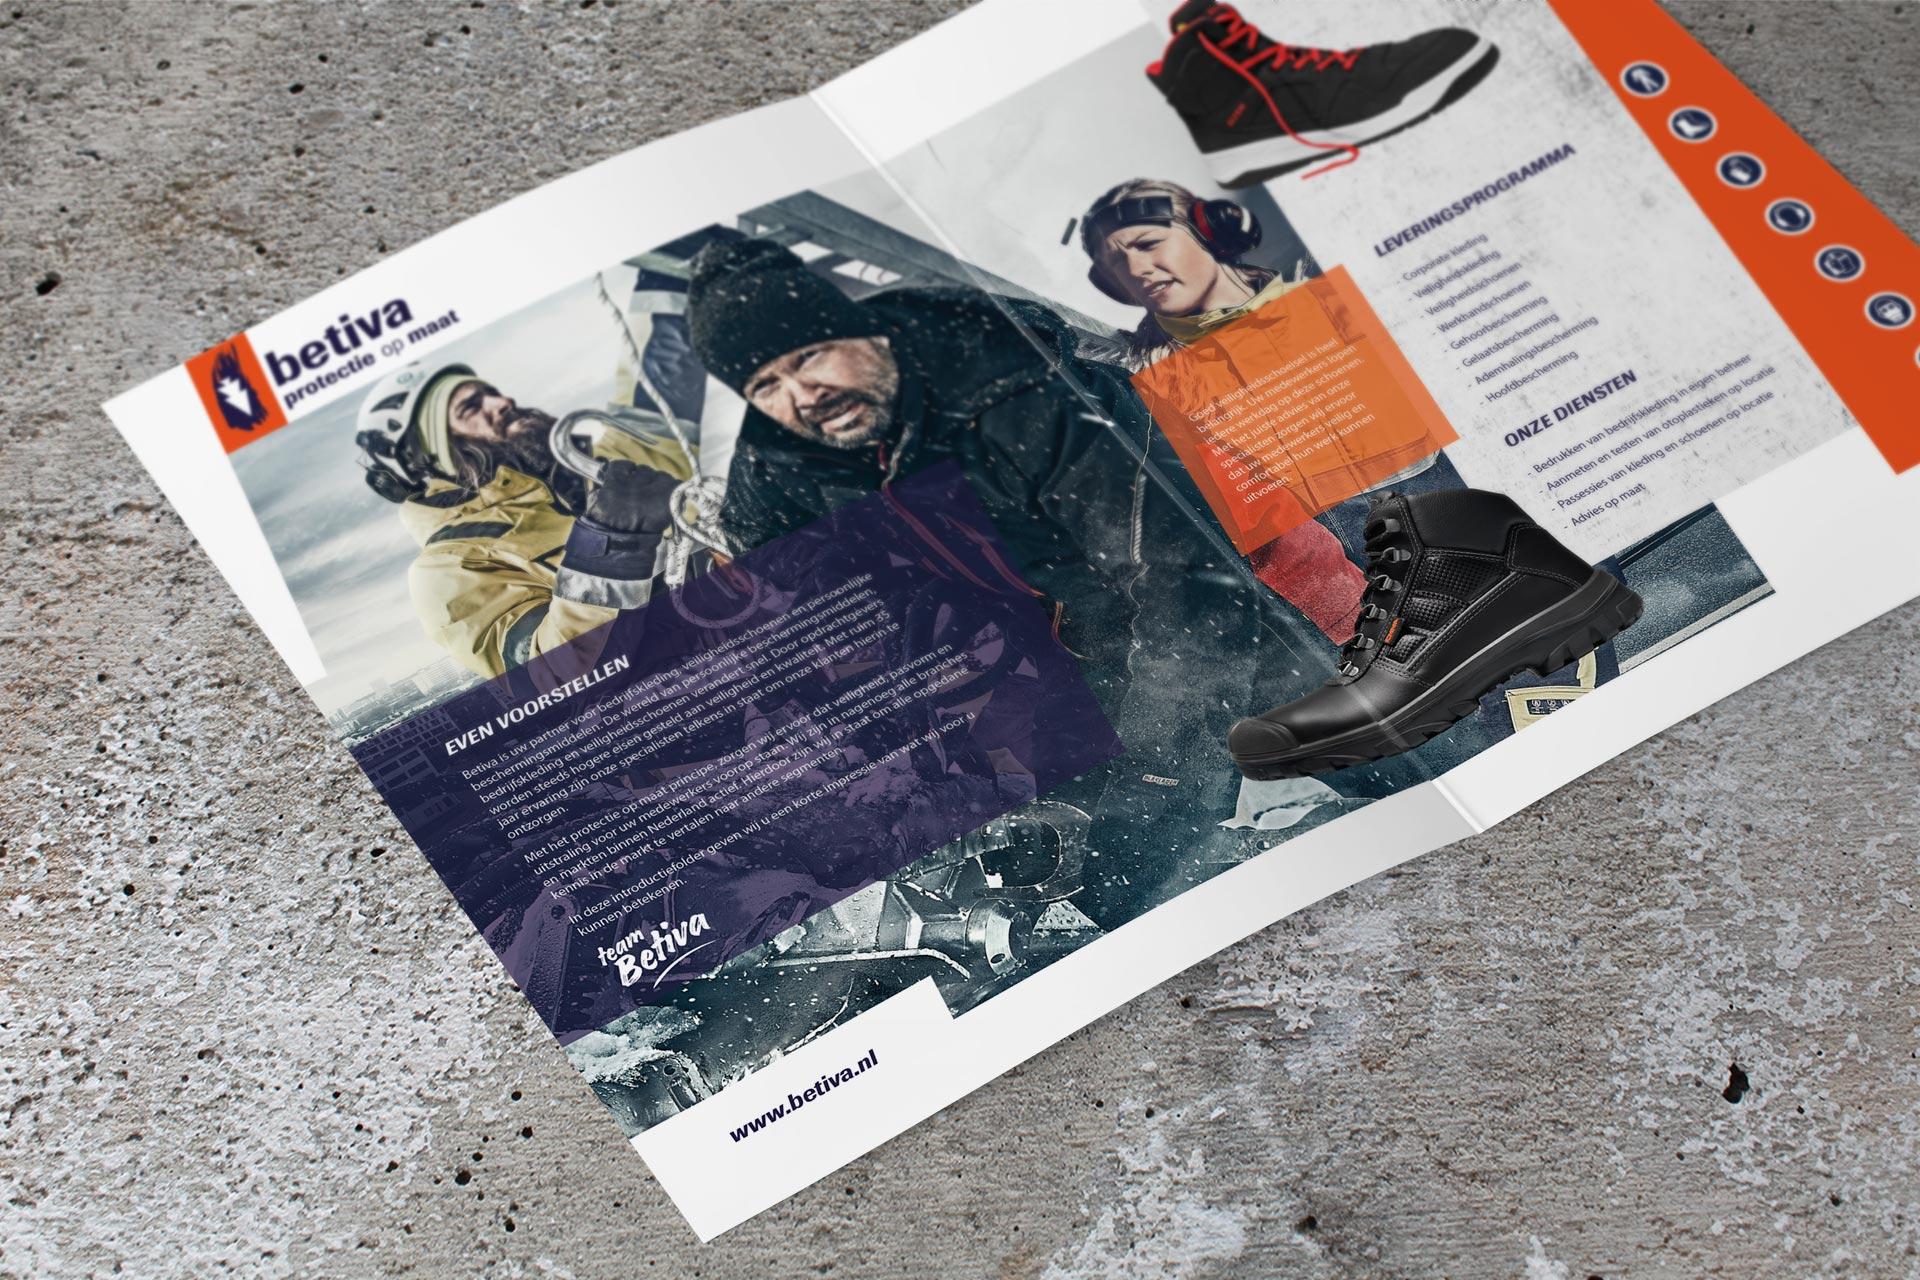 Betiva – A4 folder binnenkant